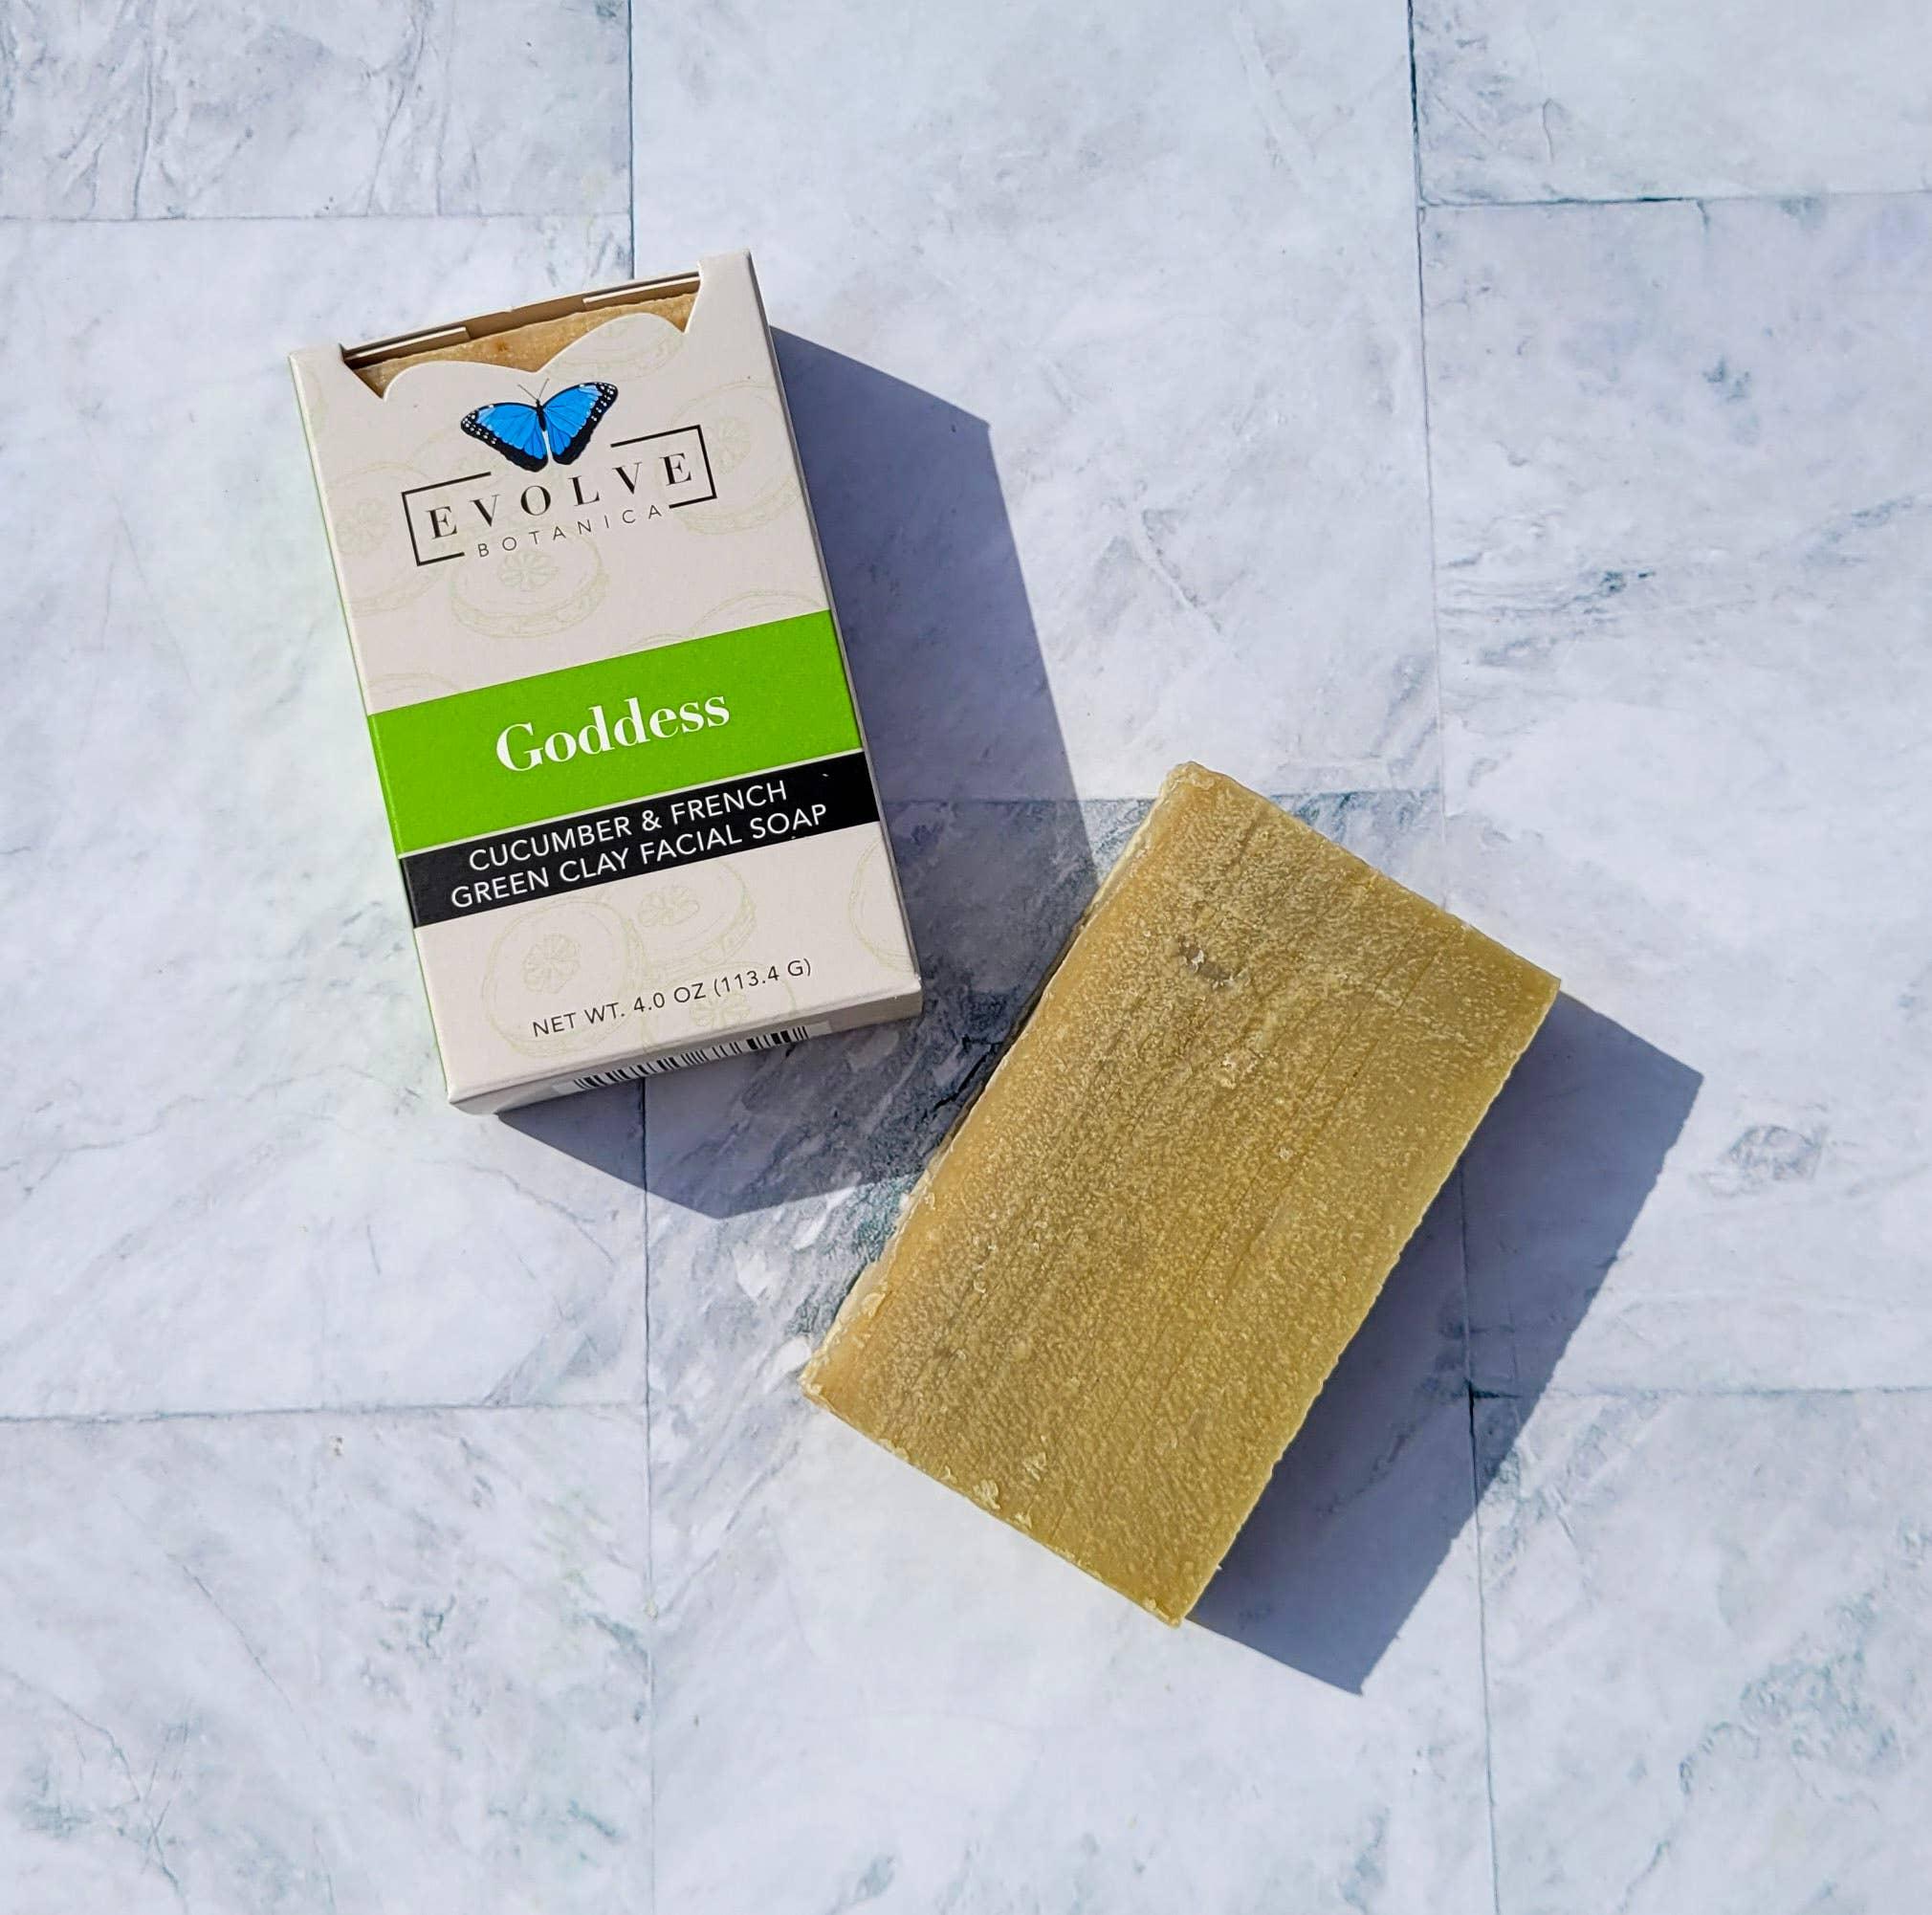 Evolve - Standard Soap - Goddess(Cucumber & Green Clay)(Face | Trada Marketplace